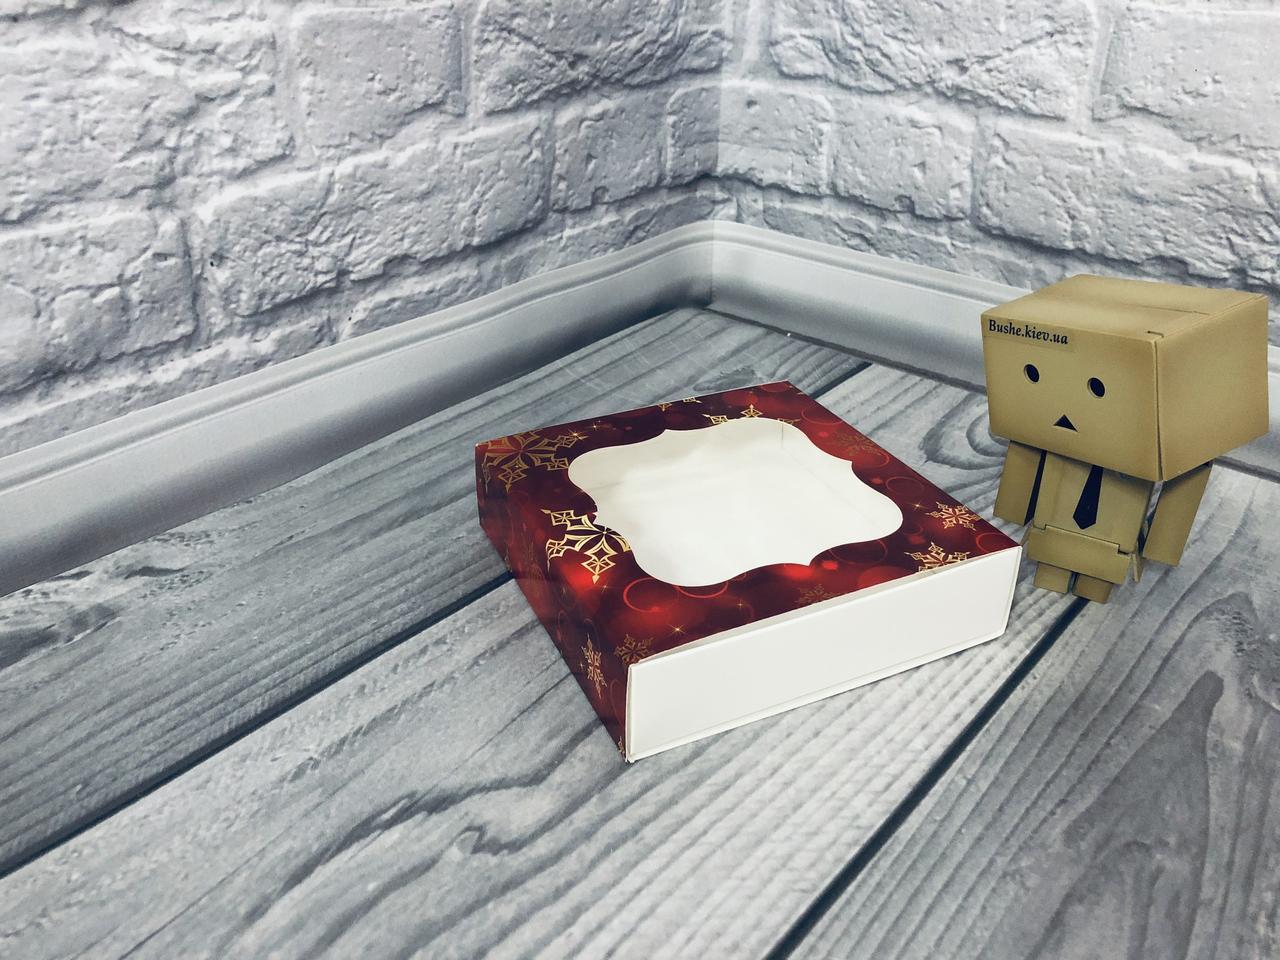 *50 шт* / Коробка для пряников / 120х120х30 мм / печать-Снег.Красн / окно-обычн / НГ